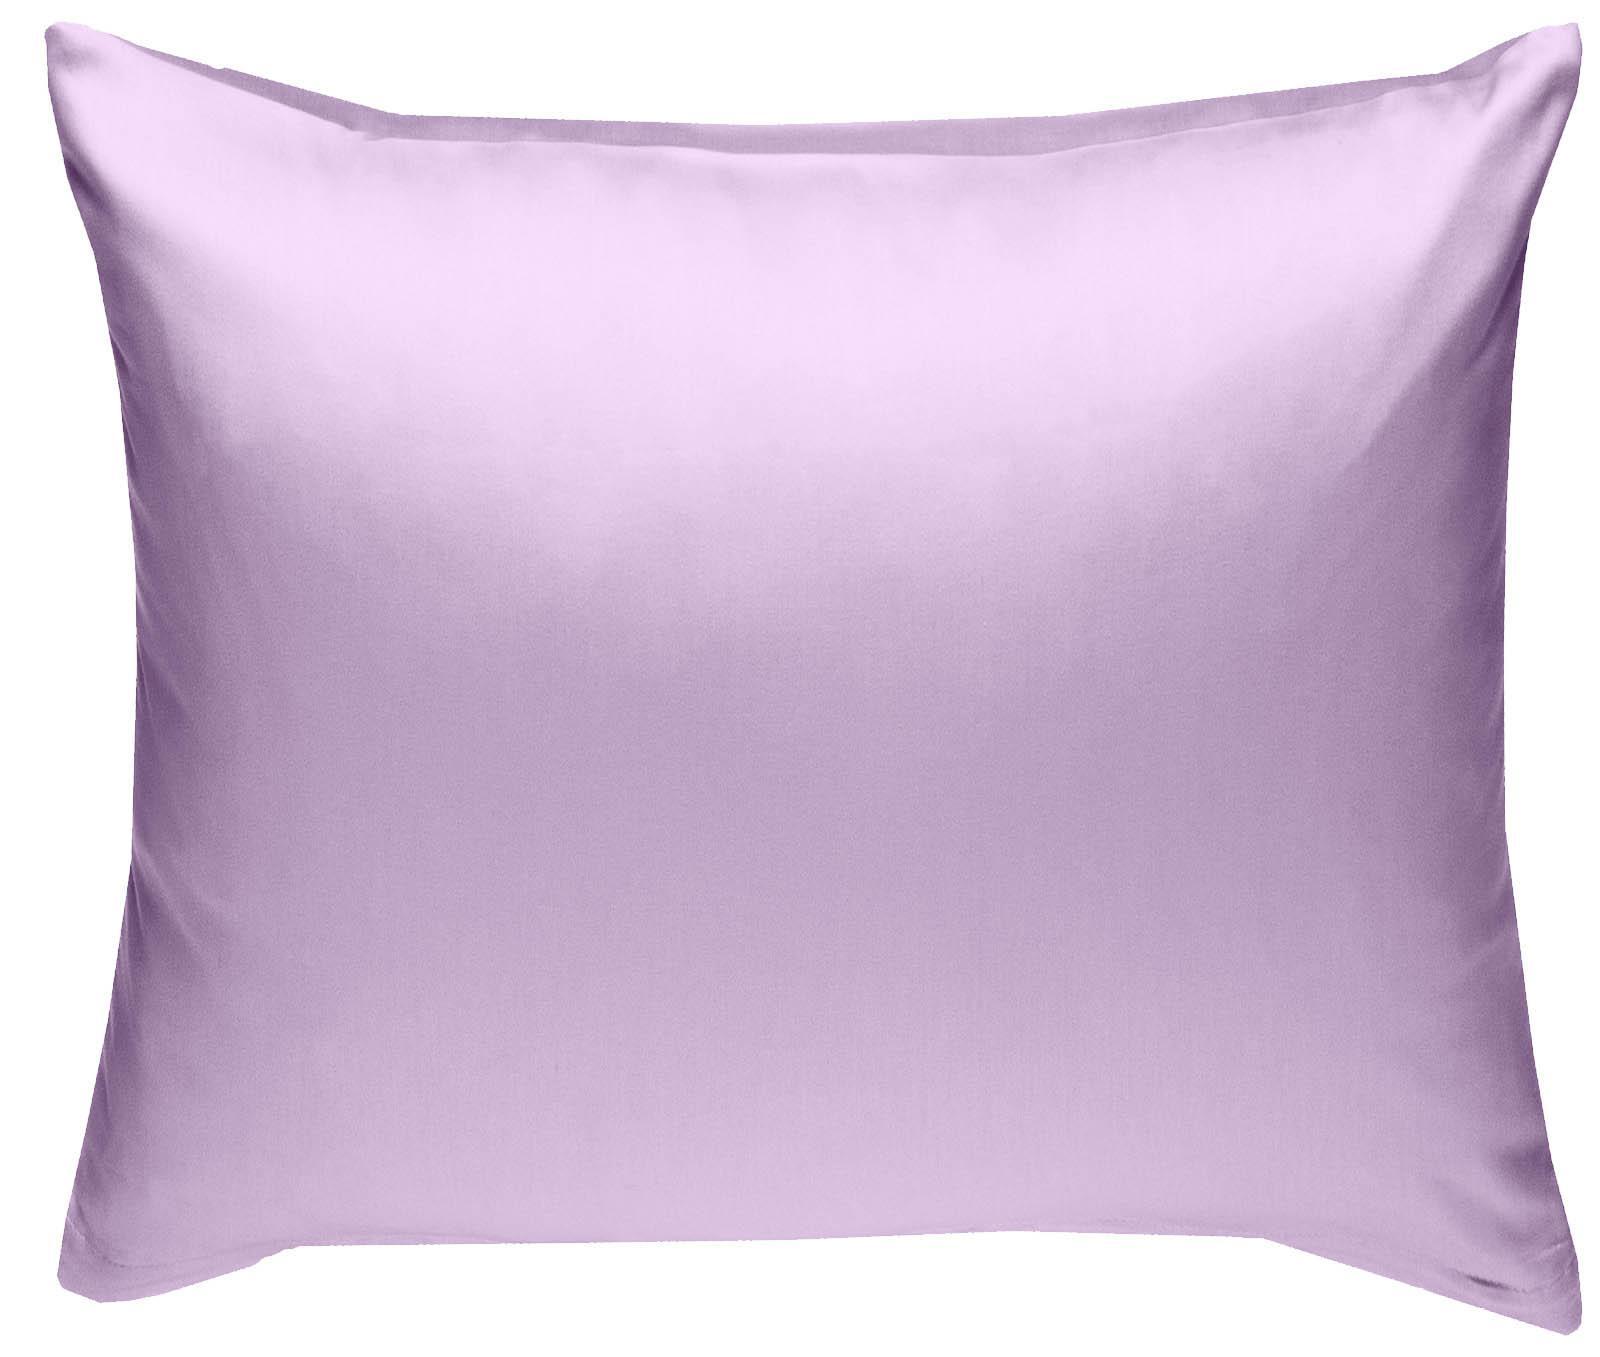 Mako Satin Kissenbezug uni flieder rosa 40x40 cm